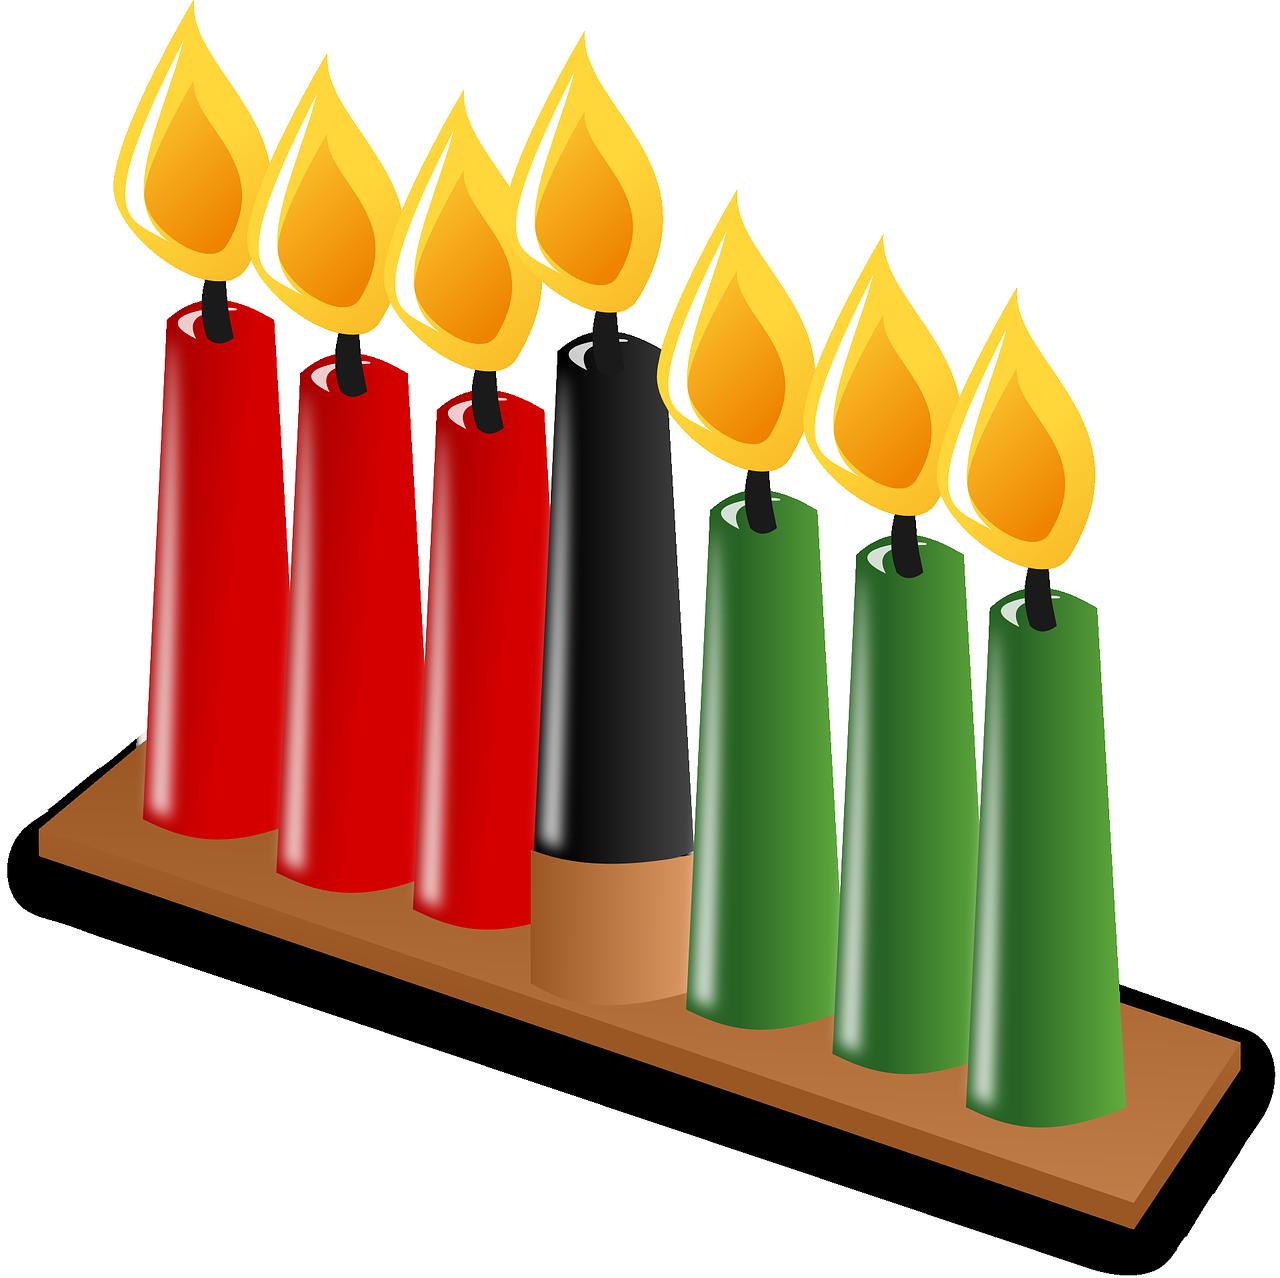 candleholder, candle holder, candlestick holder